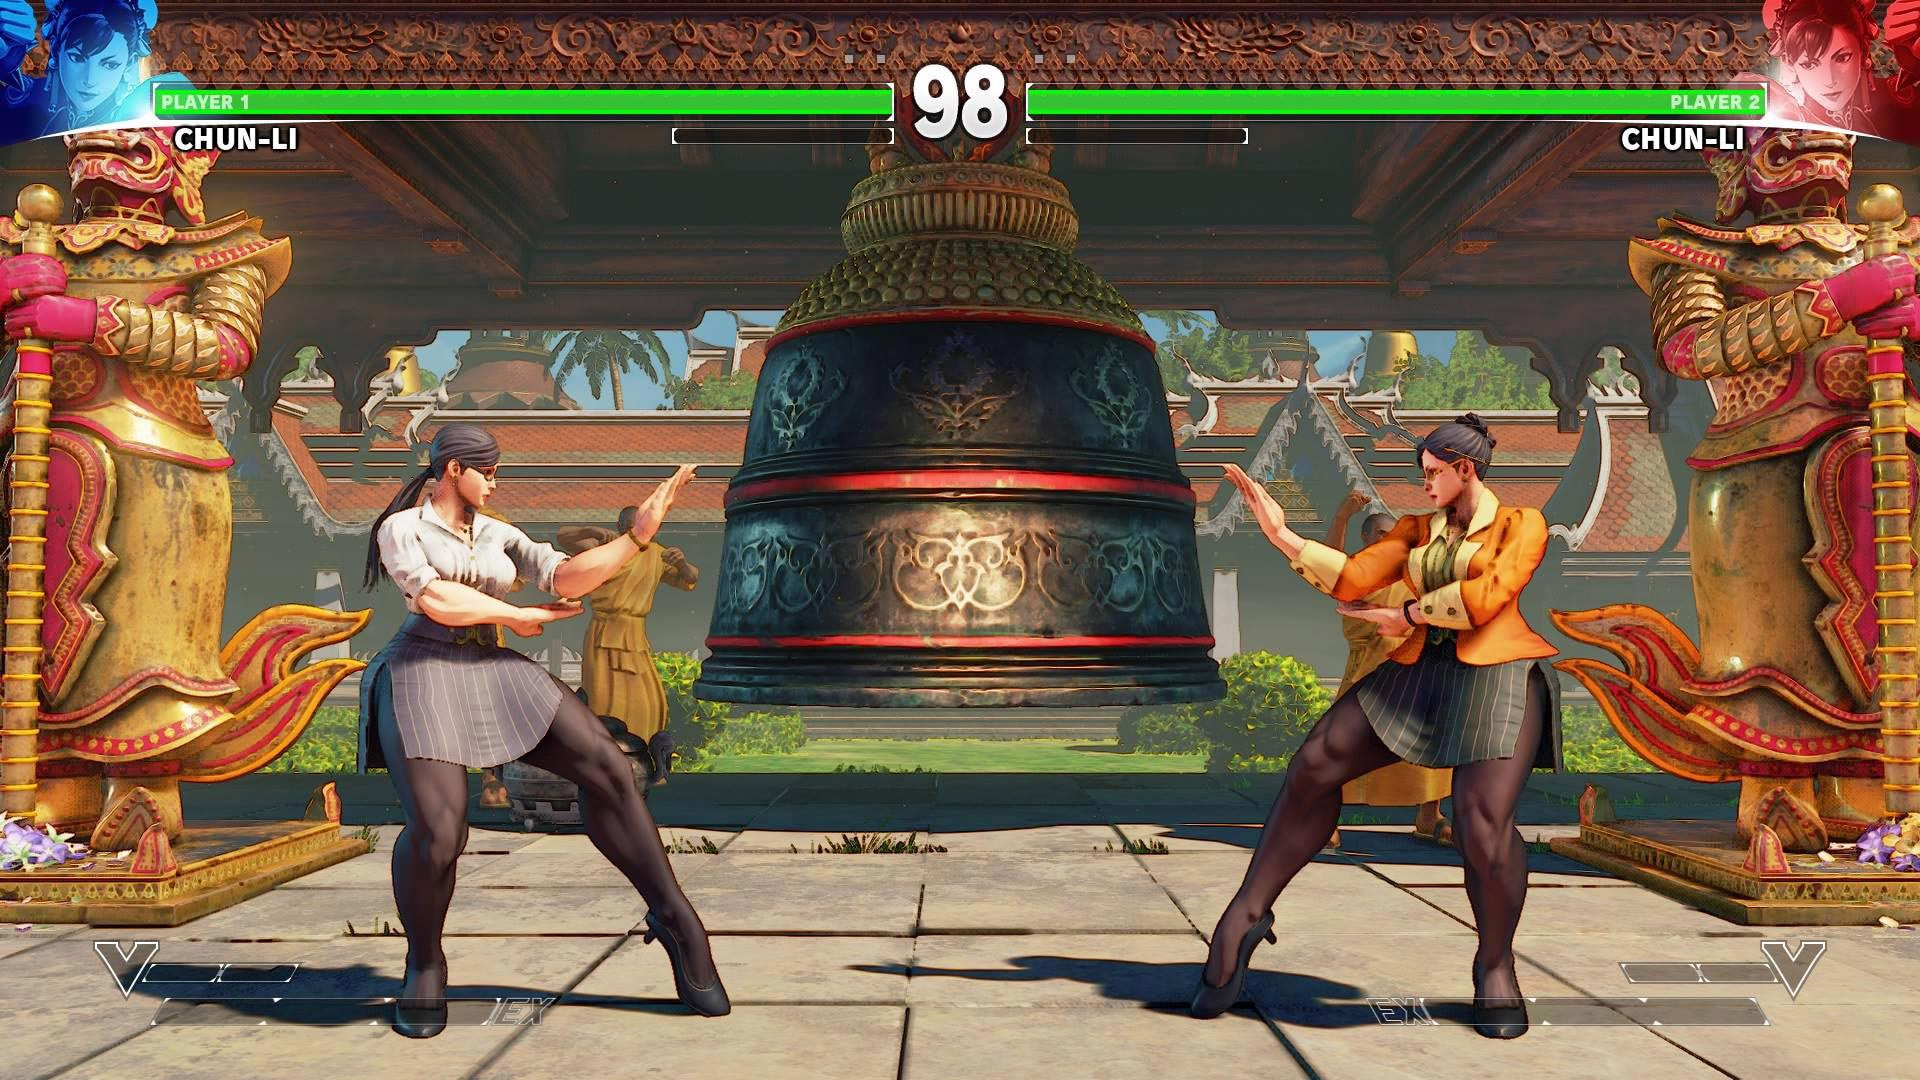 Chun-Li's Street Fighter 5 wardrobe 6 out of 13 image gallery